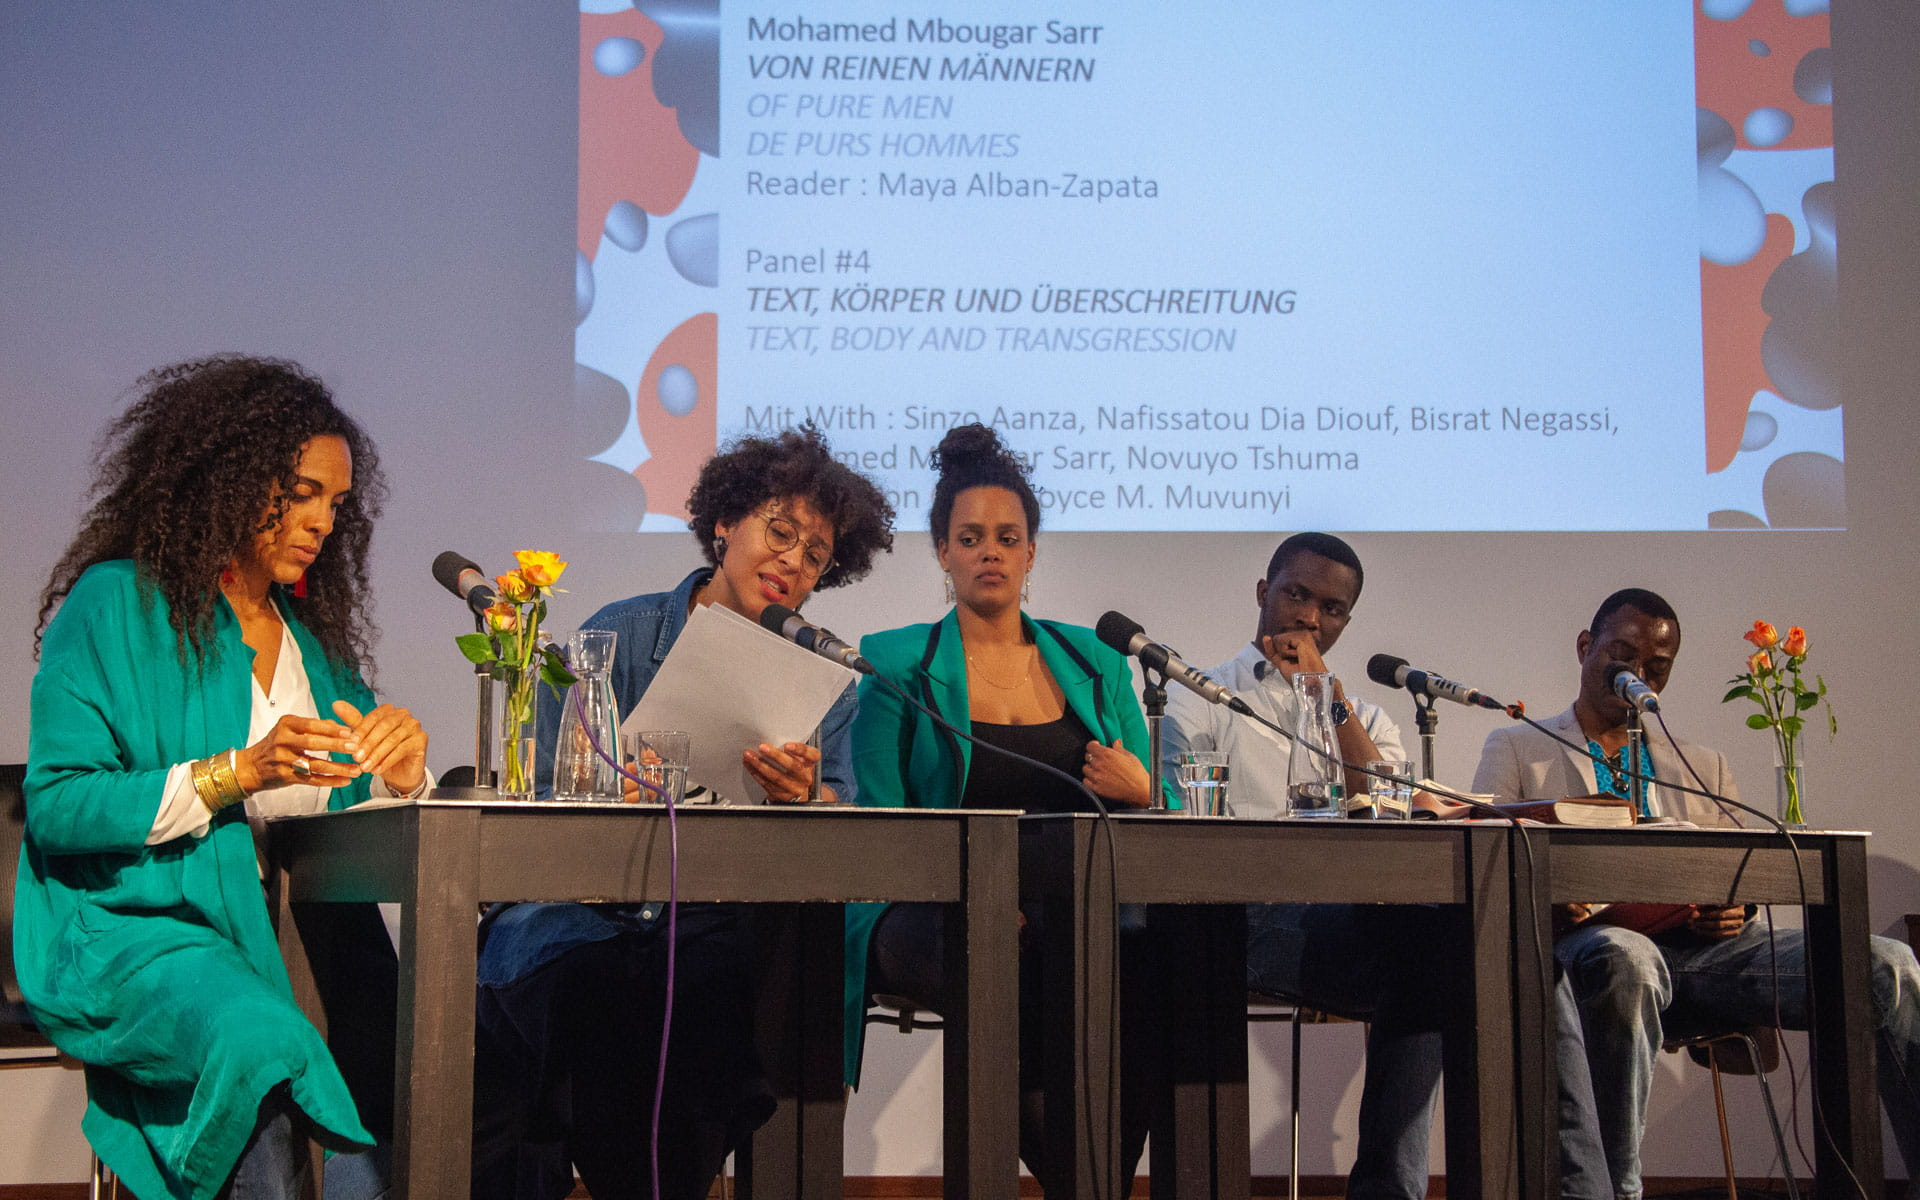 Sinzo Aanza, Nafissatou Dia Diouf, Lola Keyezua, Bisrat Negassi, Mohamed Mbougar Sarr, Novuyo Rosa Tshuma: Panel #4 Text, Körper und Überschreitung <br/>(c) Lemia Bodden